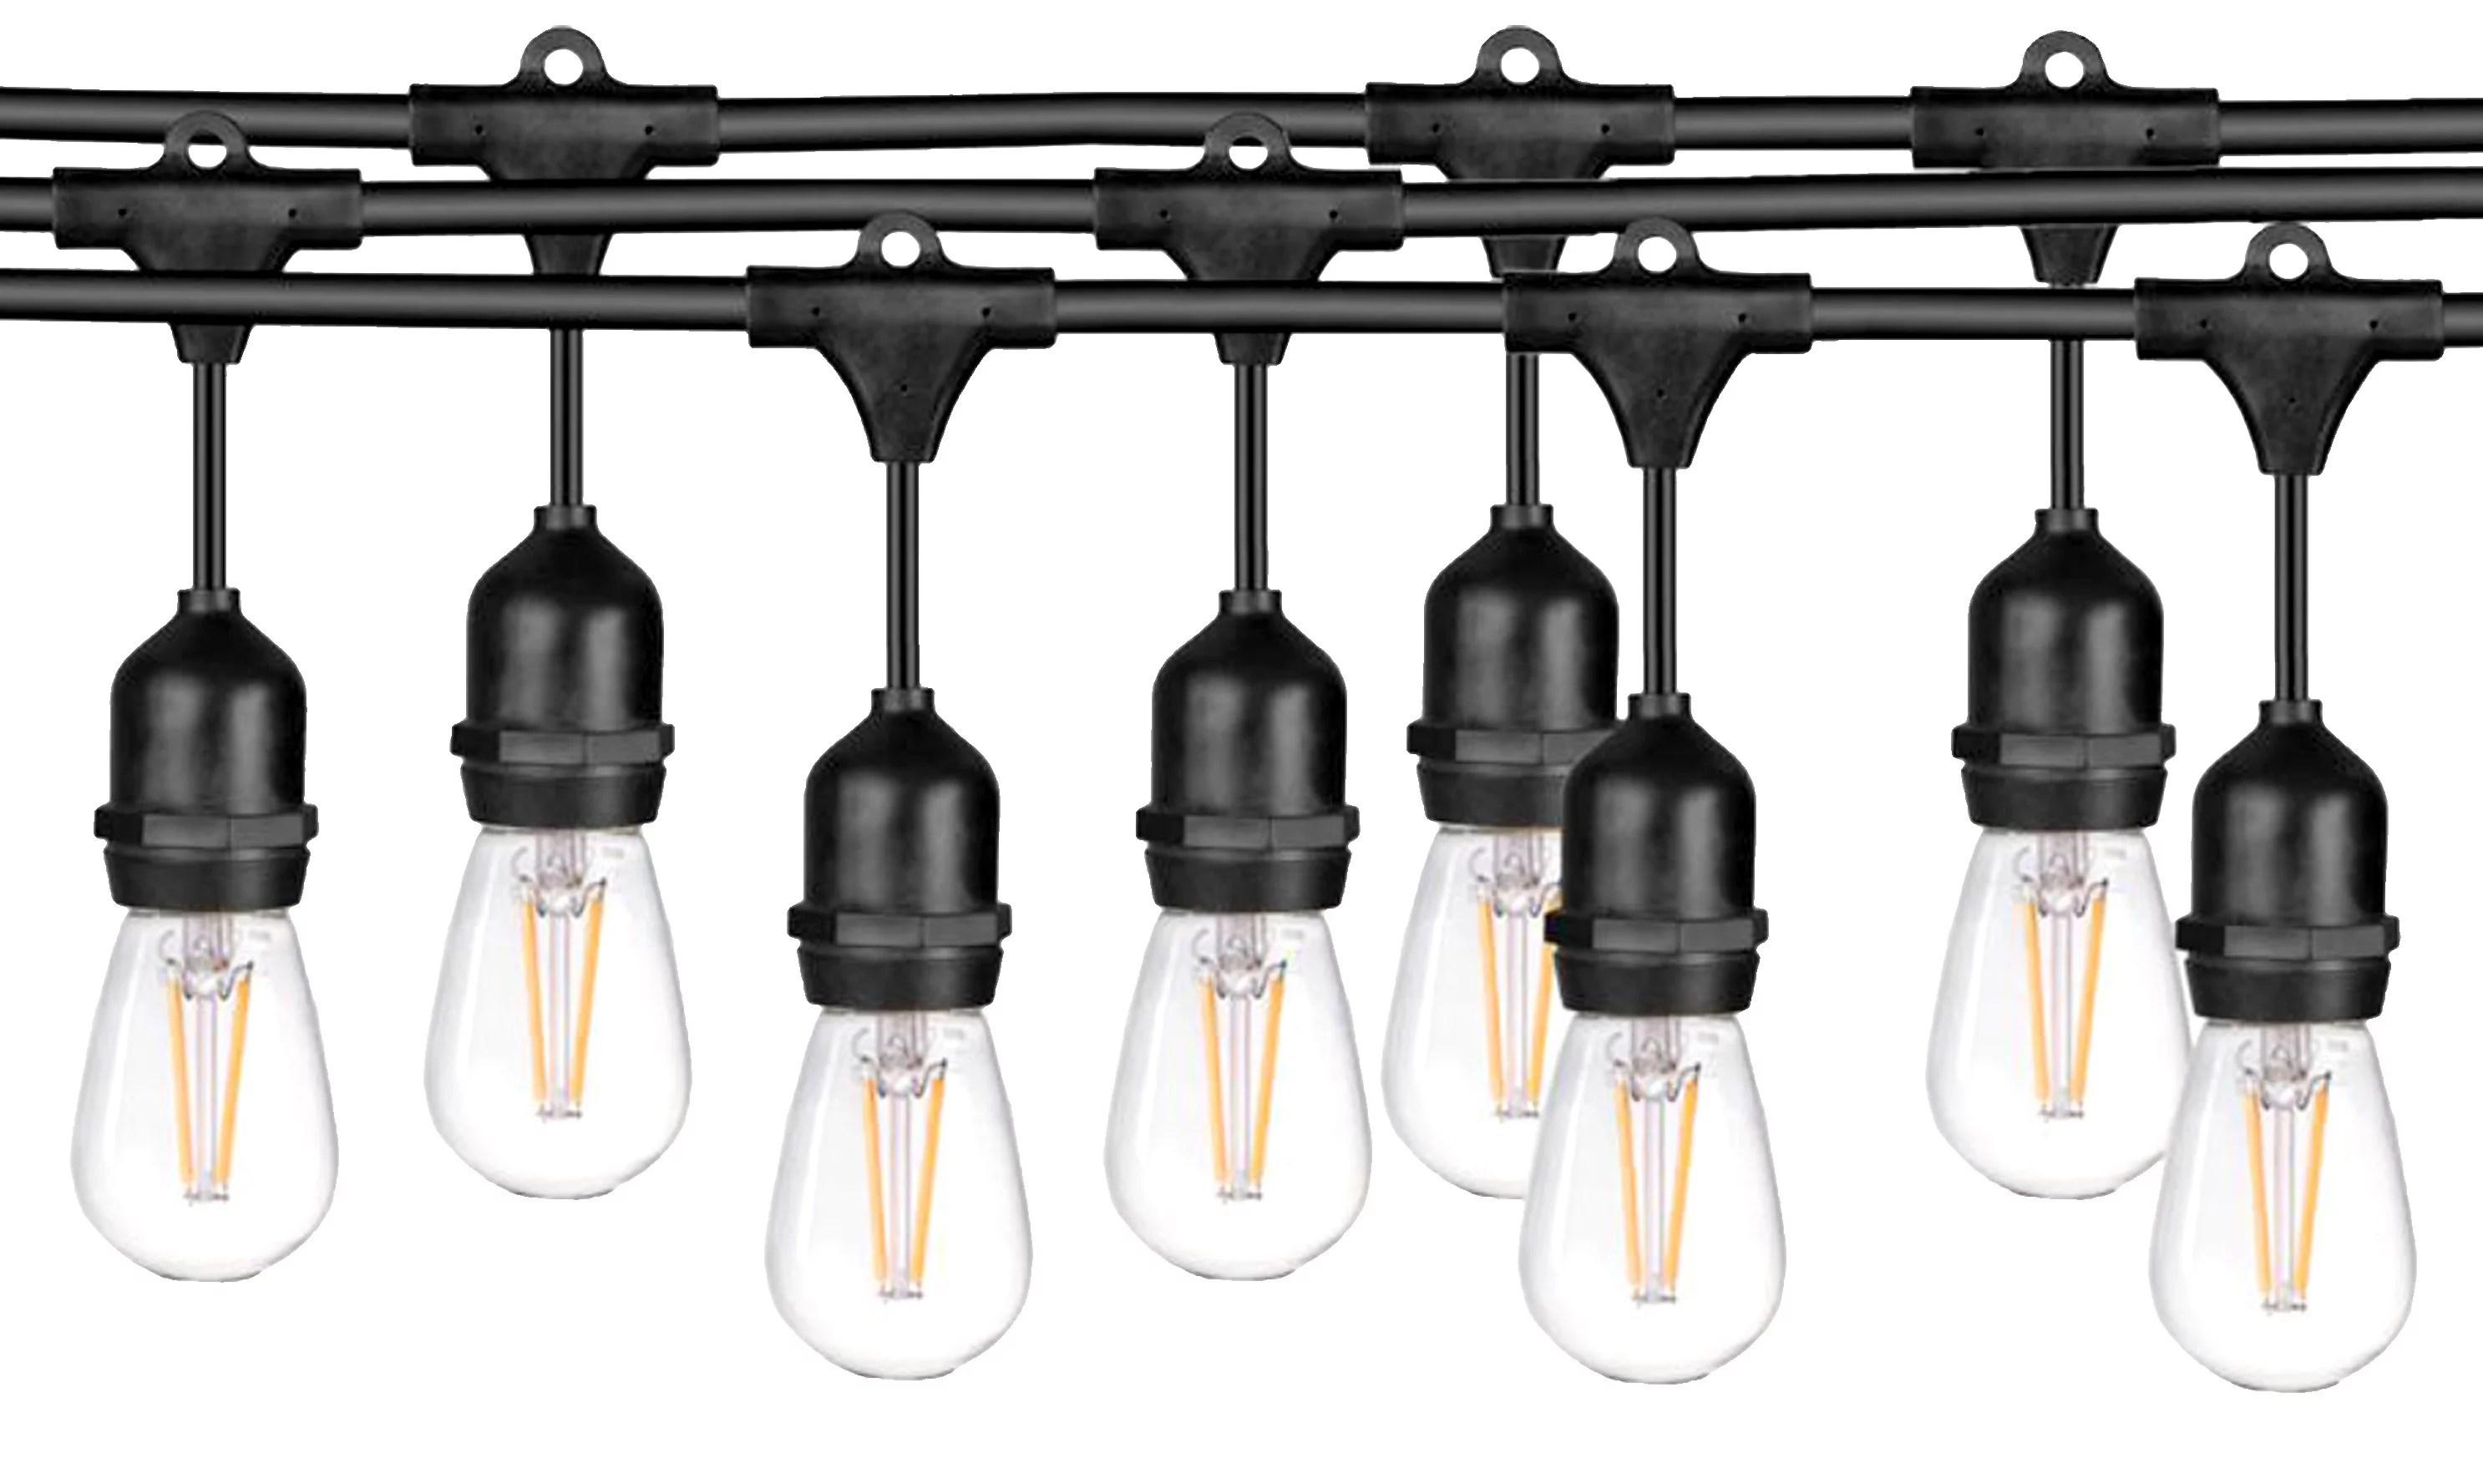 Ledpax 48 Ft Led Outdoor Waterproof String Lights 15